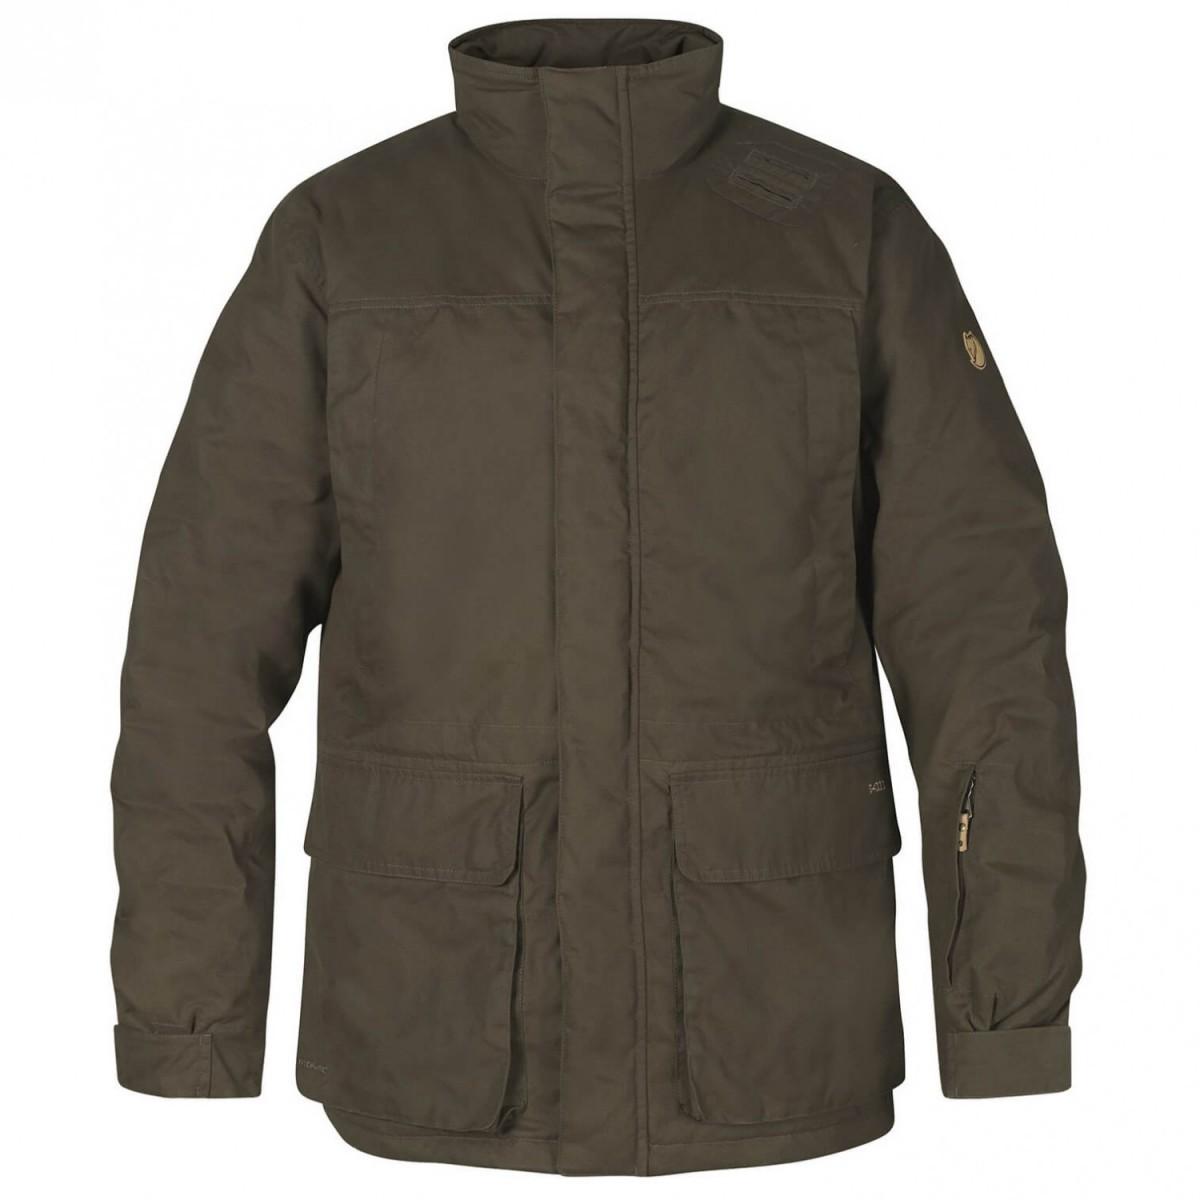 FJALLRAVEN フェールラーベン Brenner Pro Padded Jacket ジャケット (Dark Olive)